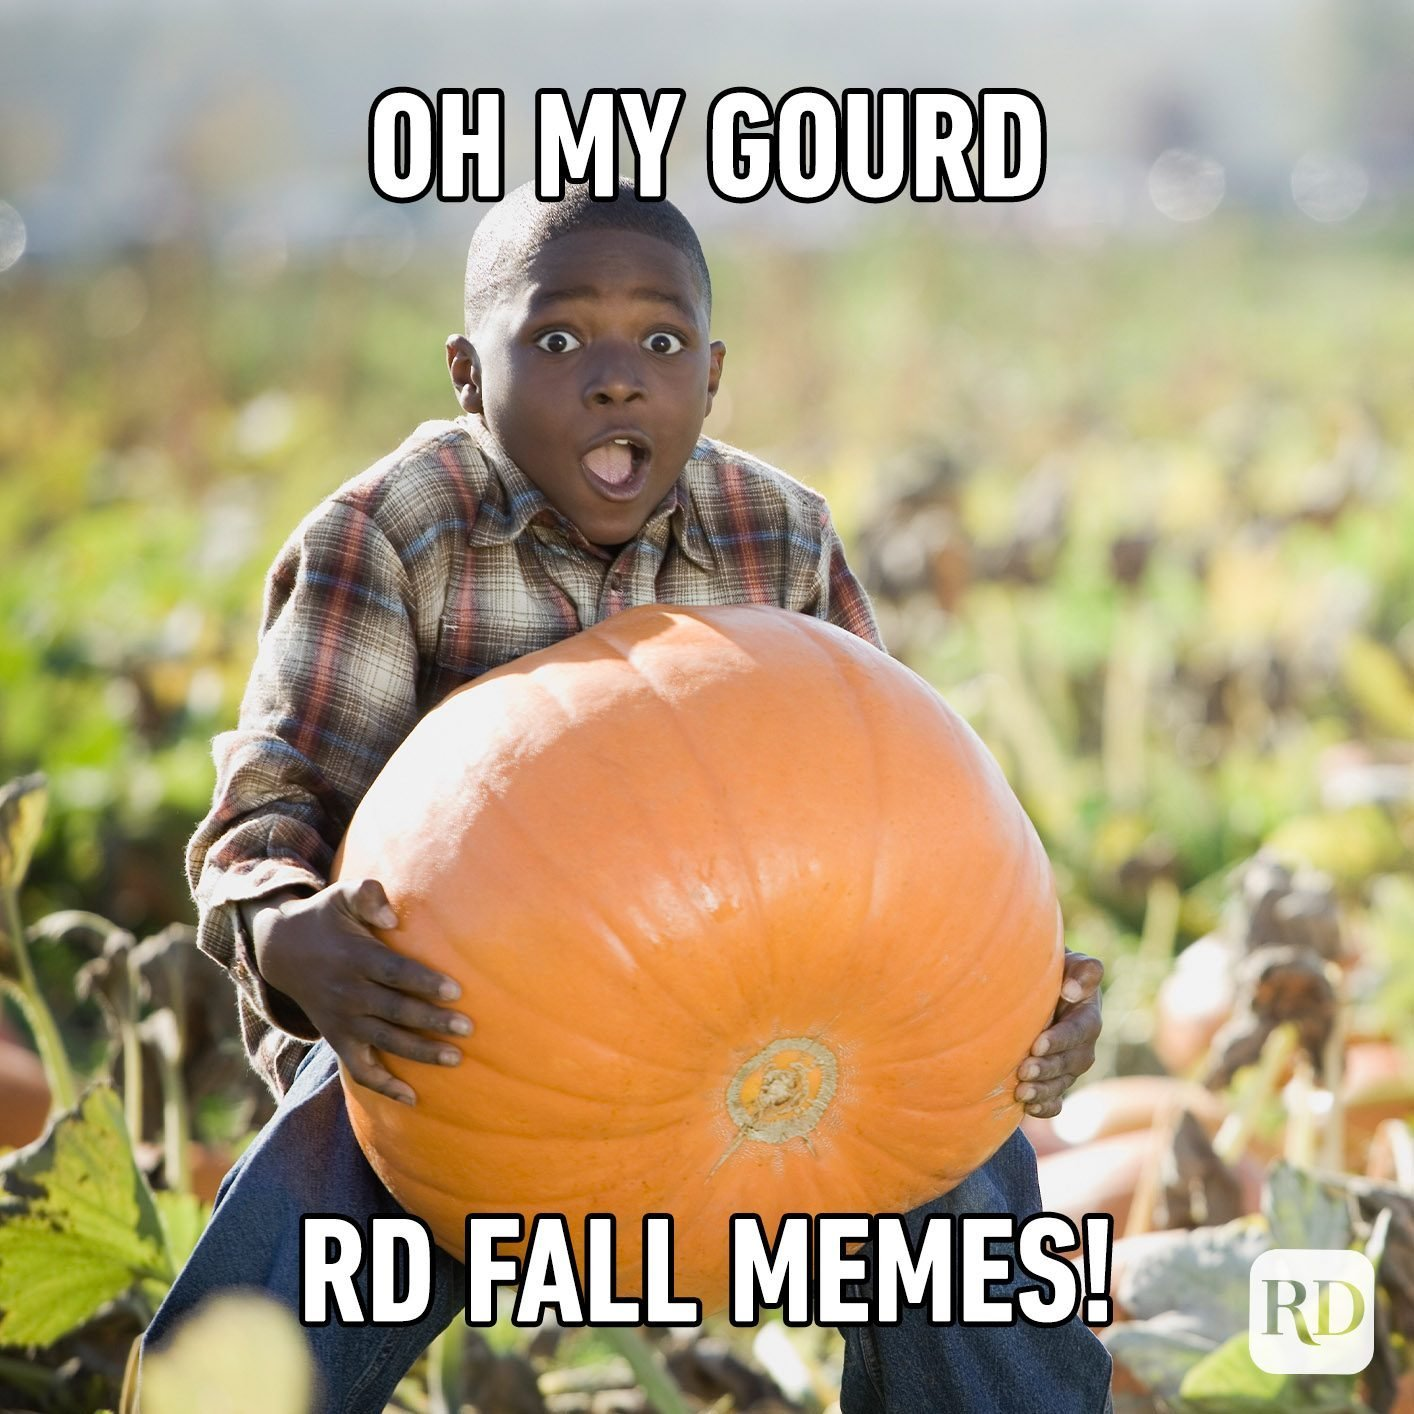 28 Hilarious Fall Memes You'll Love